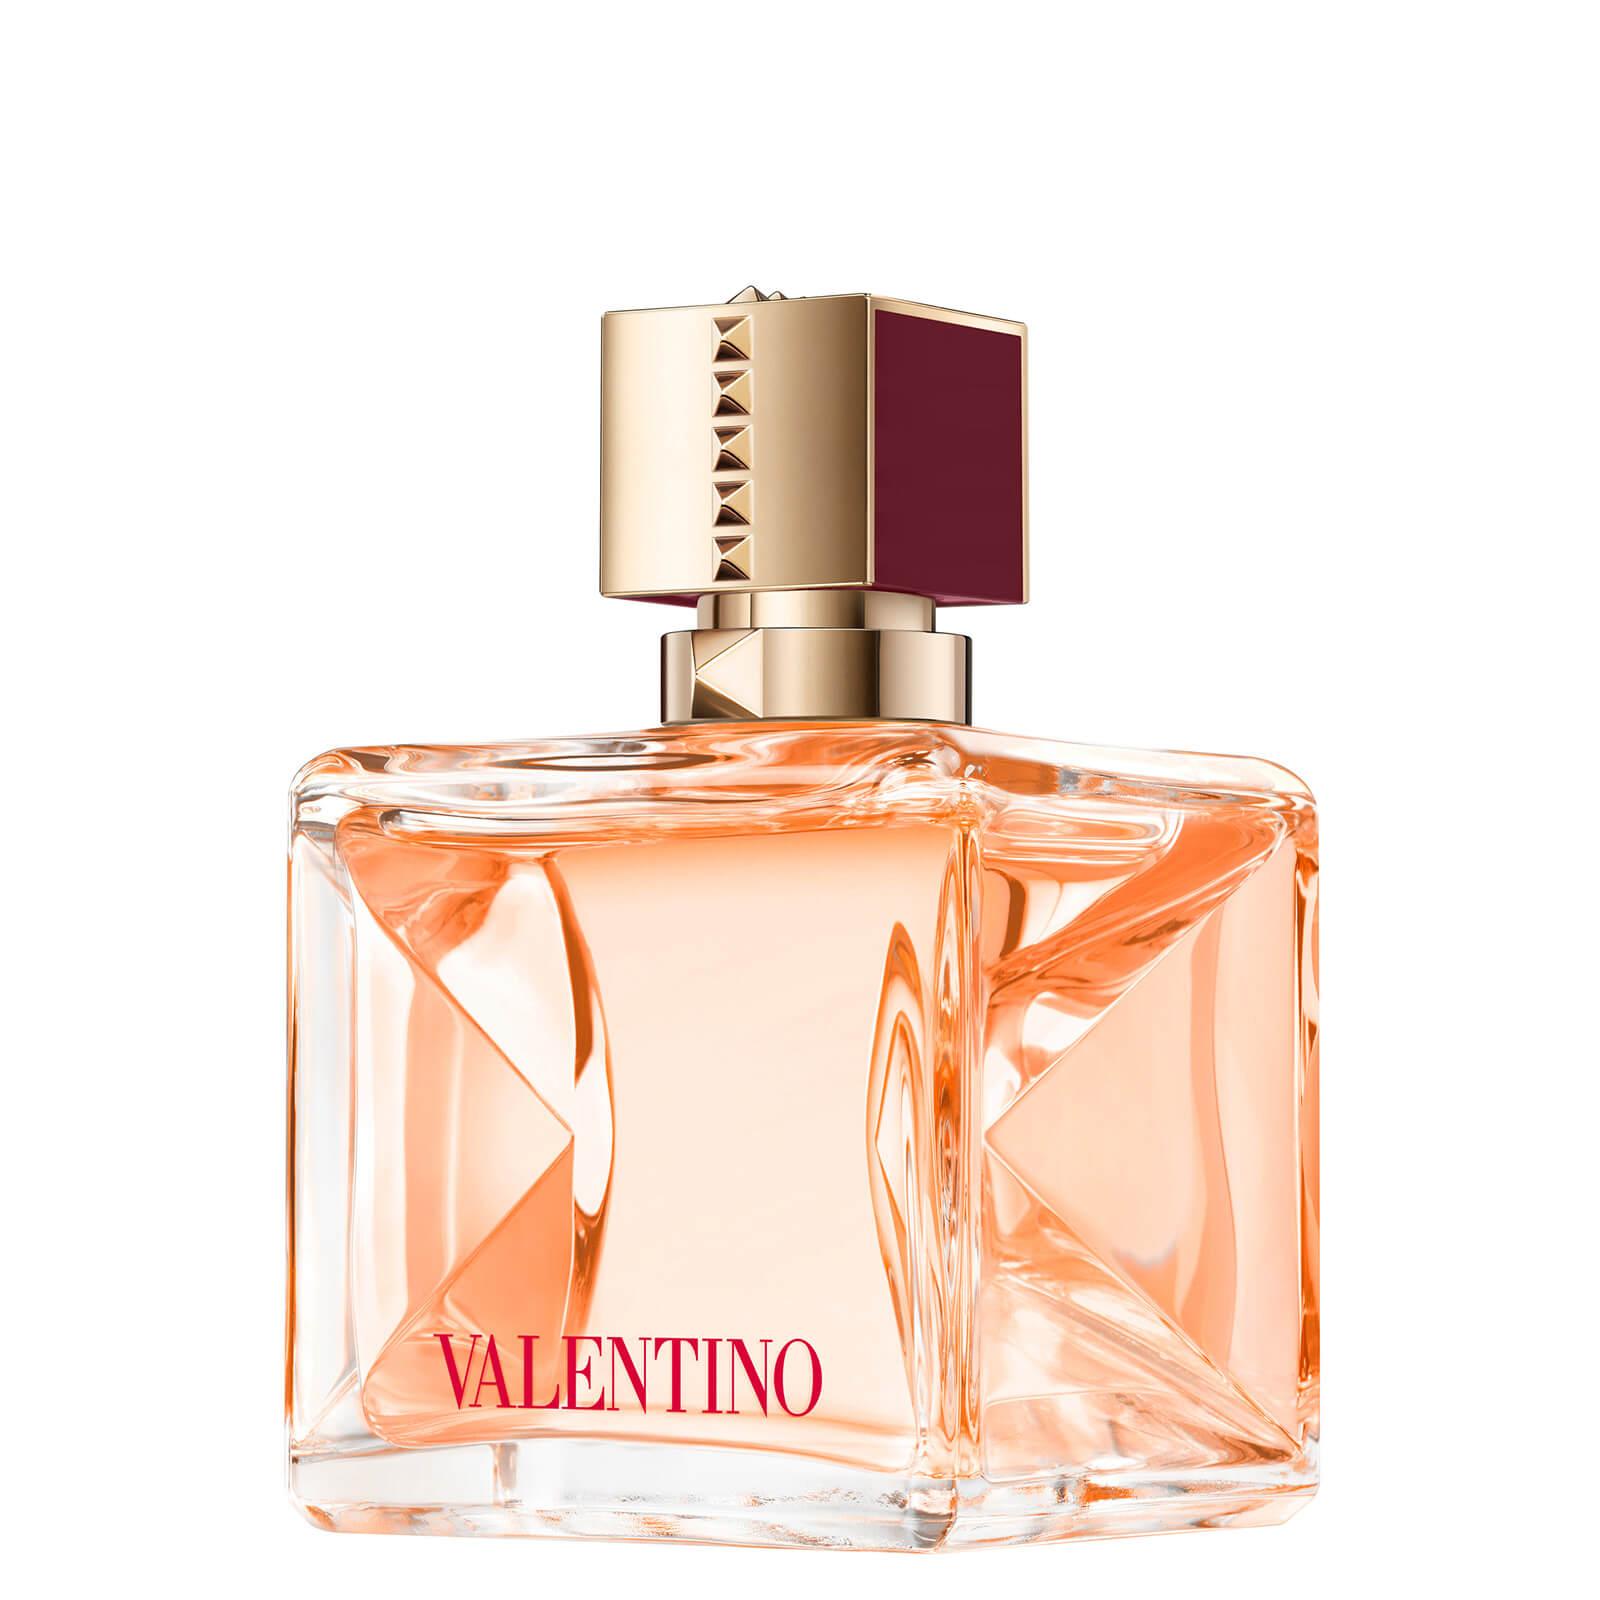 Купить Valentino Voce Viva Intensa Eau de Parfum (Various Sizes) - 100ml